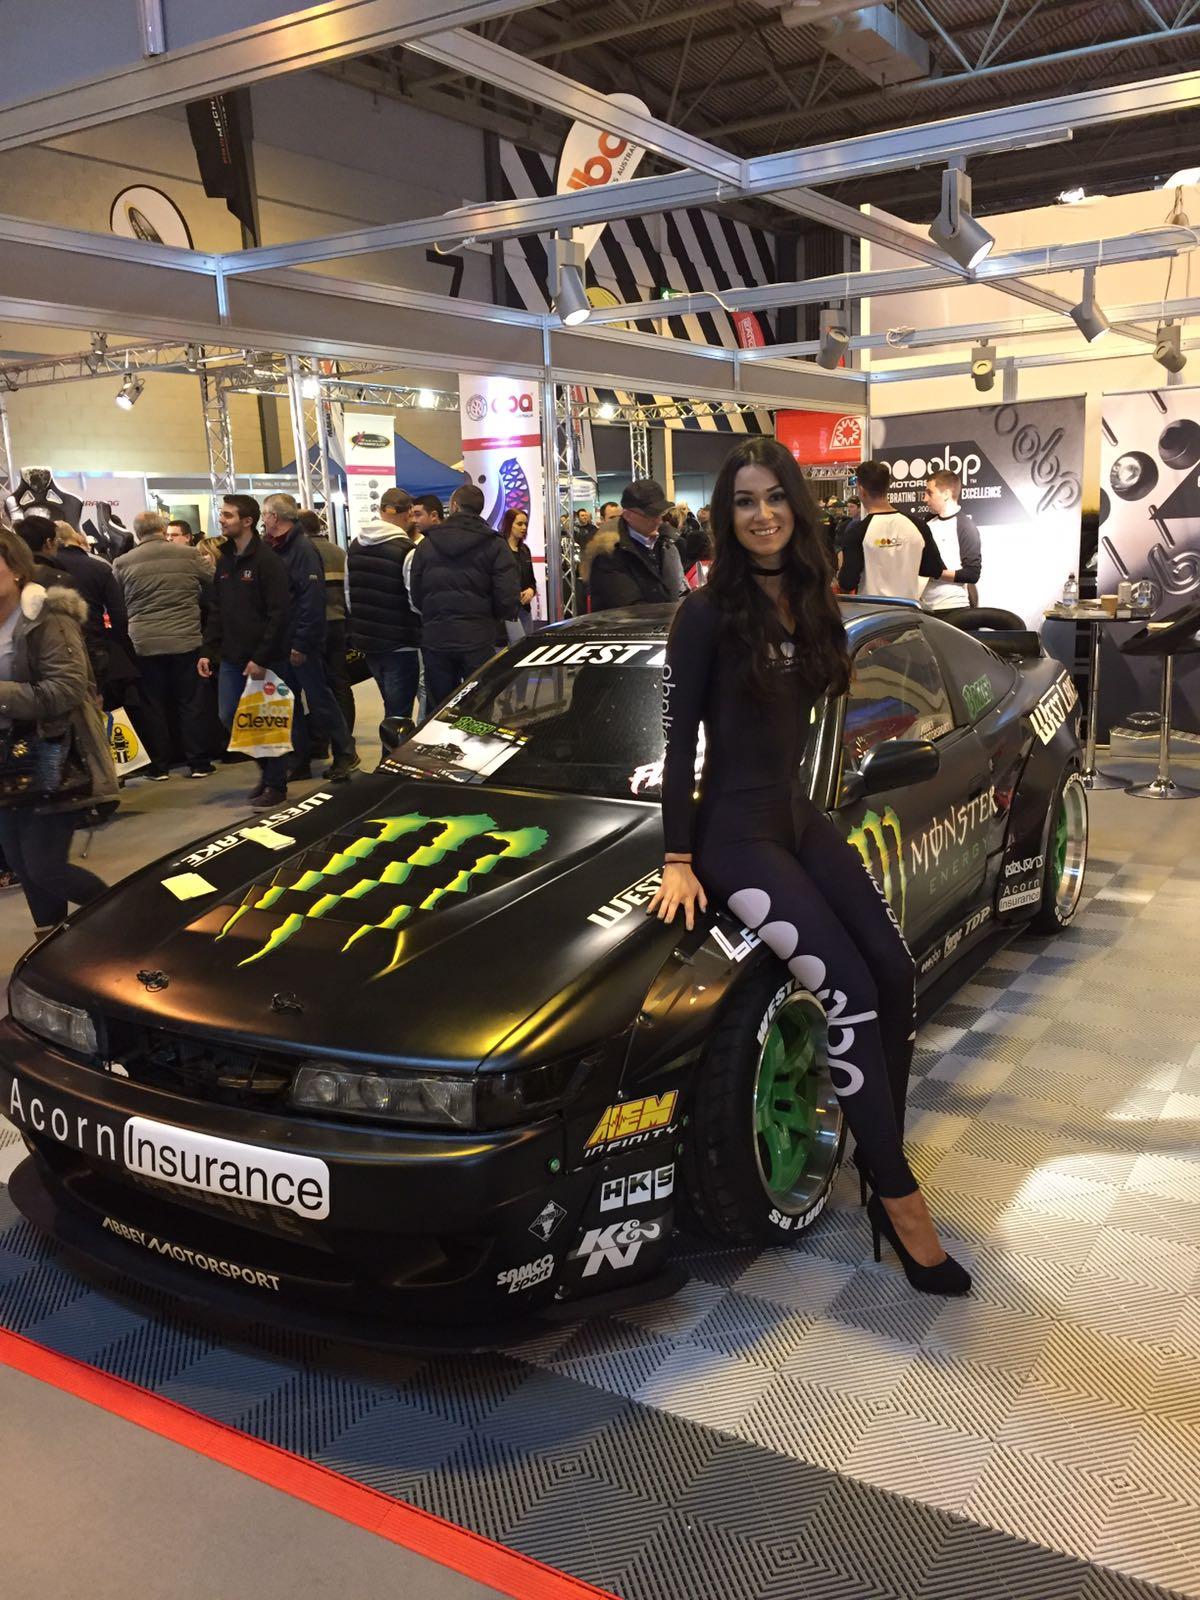 Obp Motorsport Autosport International 2017 Birmingham Nec 01